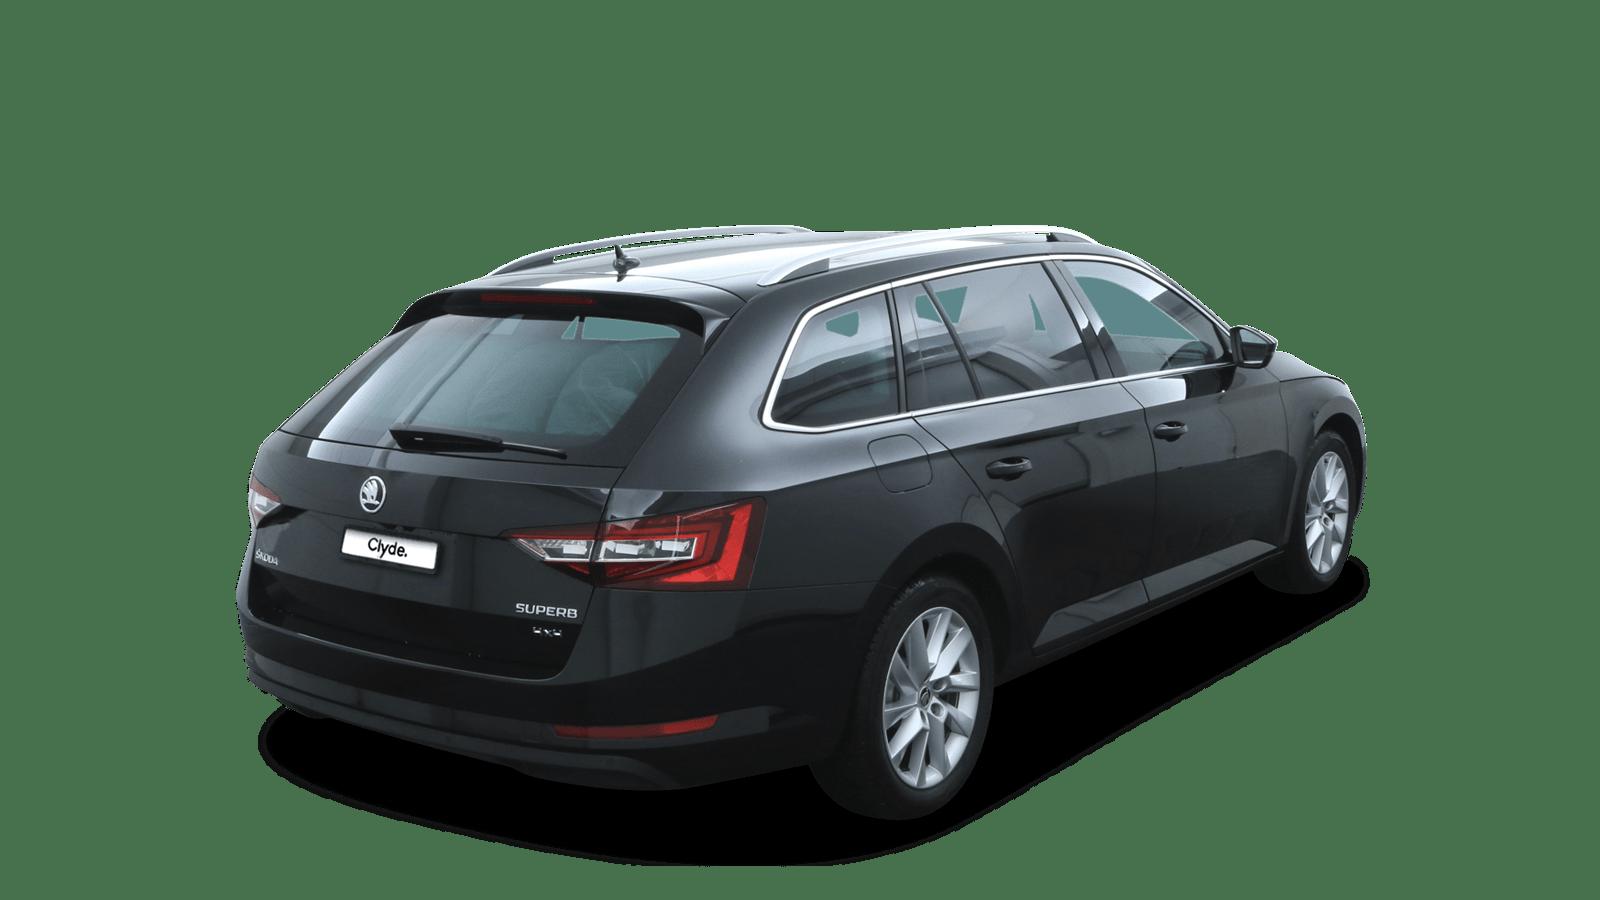 ŠKODA Superb Black back - Clyde car subscription